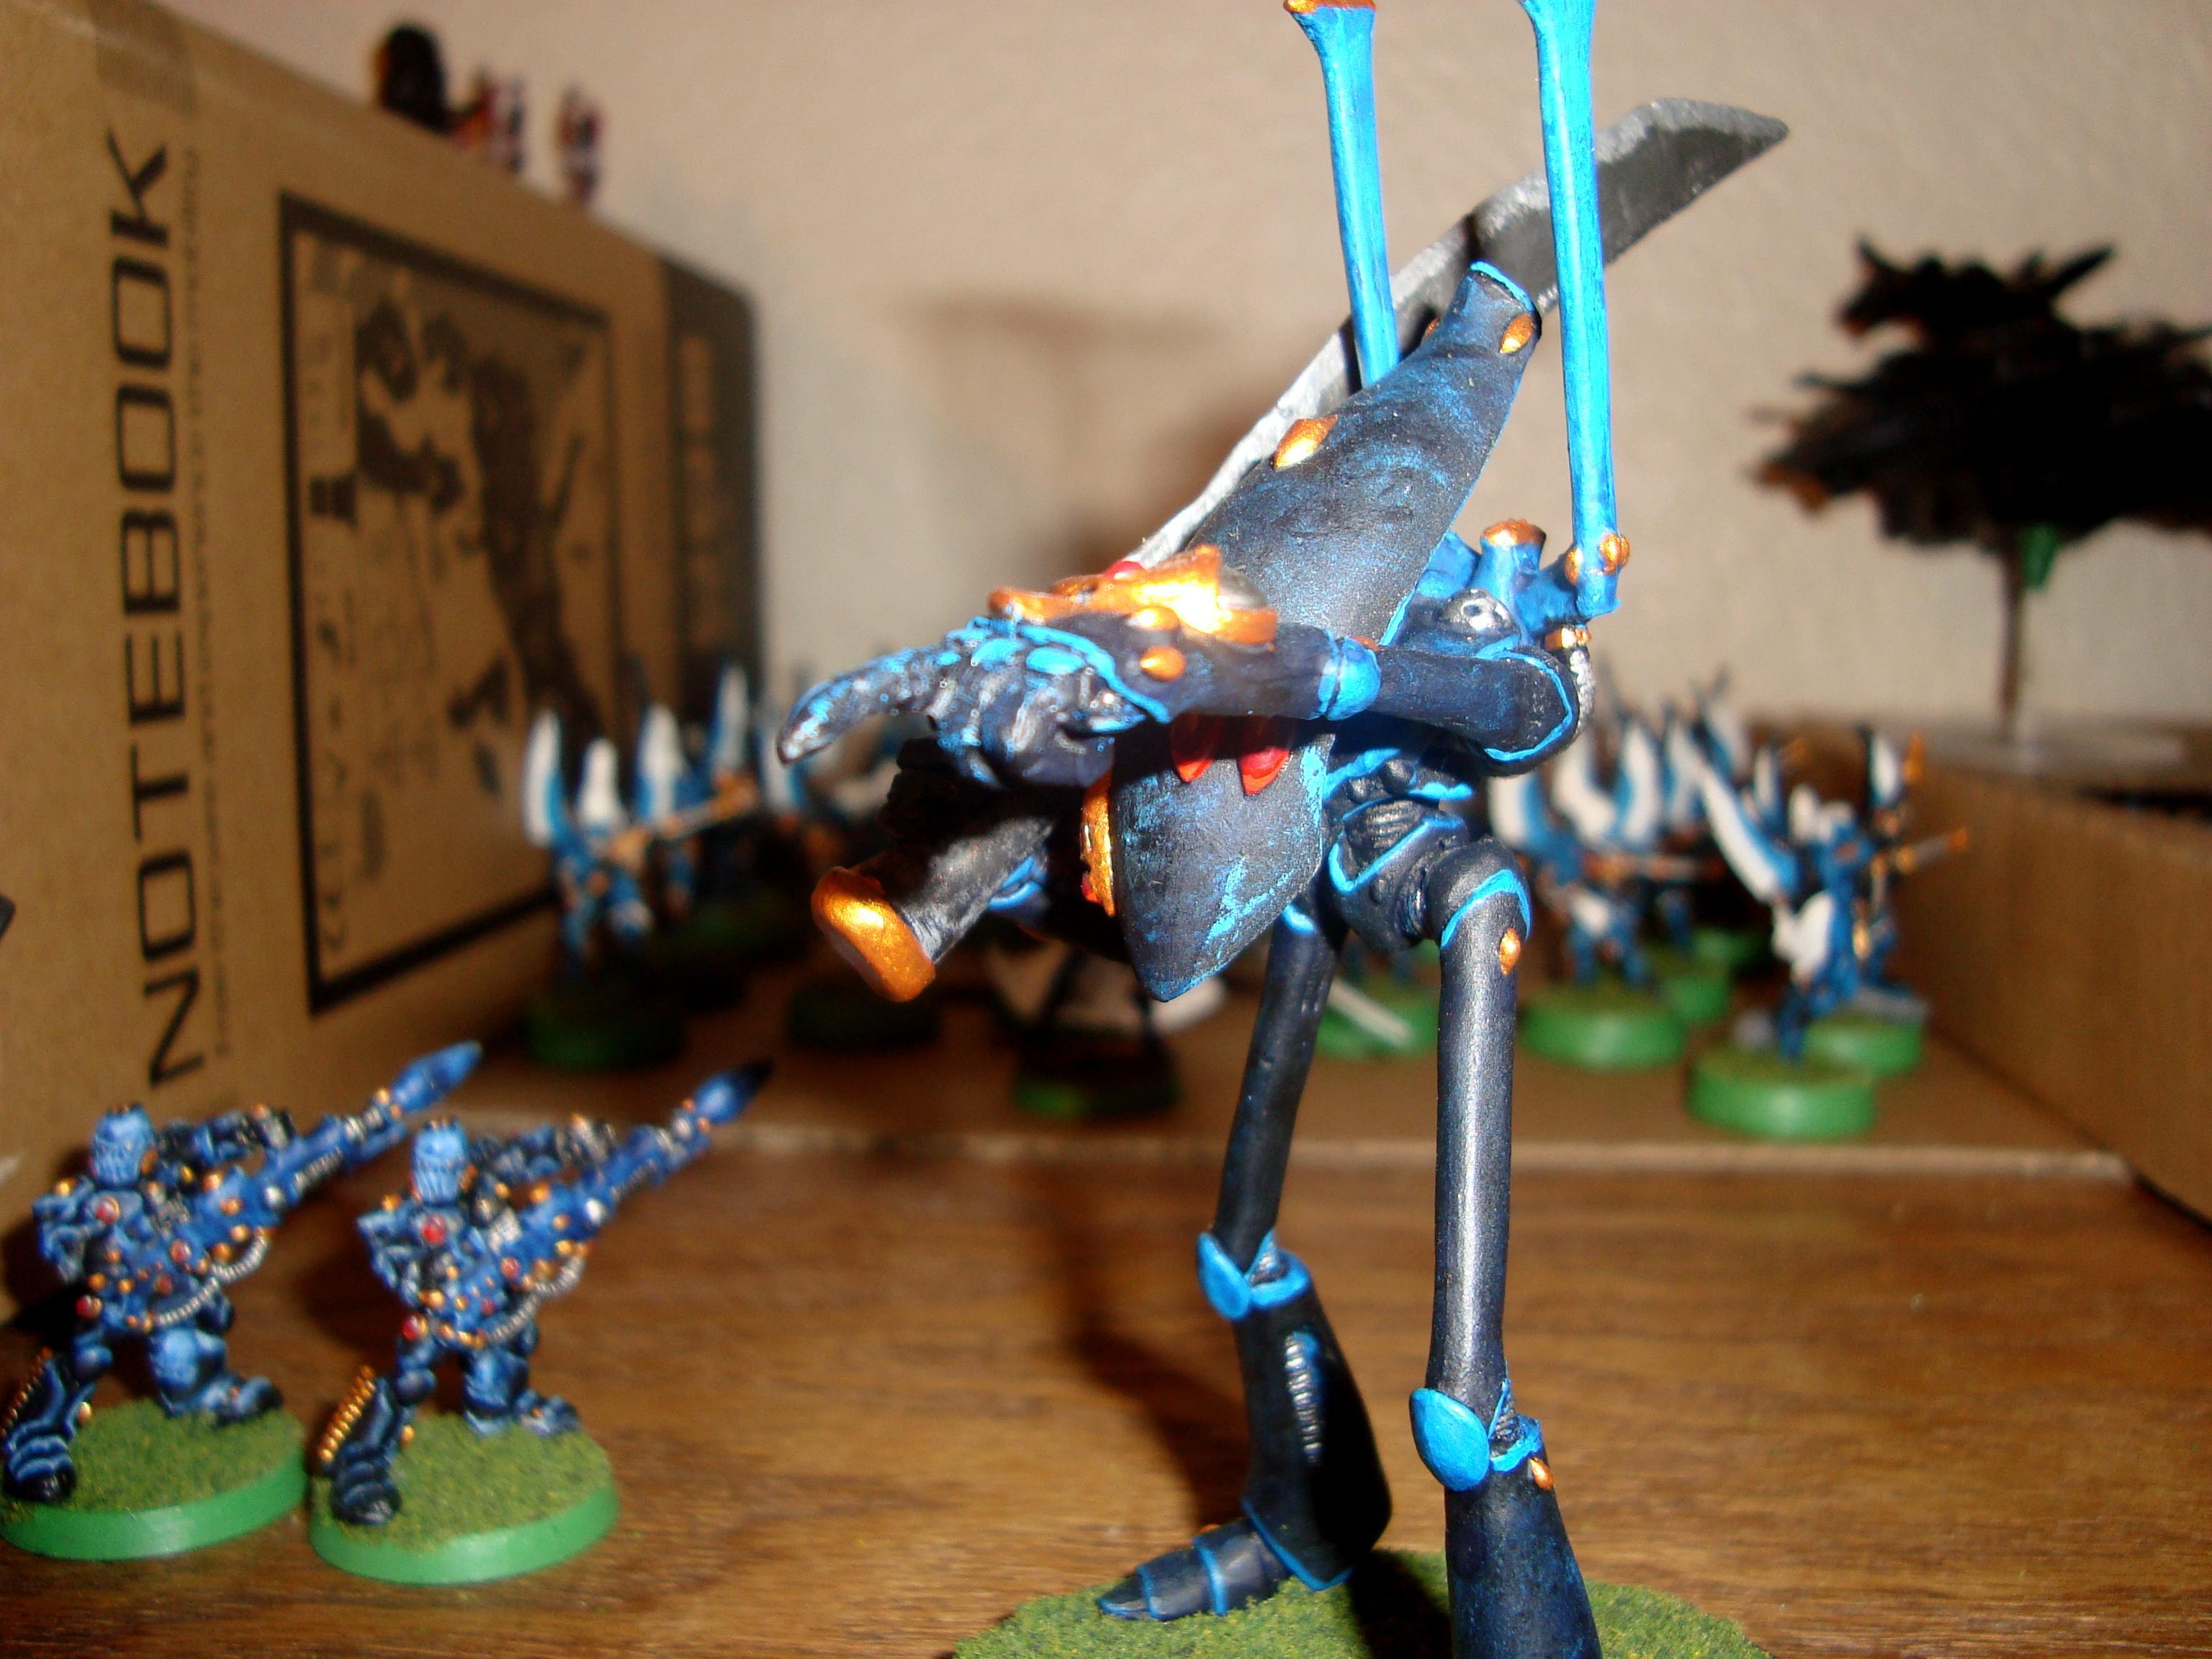 Conversion, Eldar, Uaire-nem, Warhammer 40,000, Wraithlord